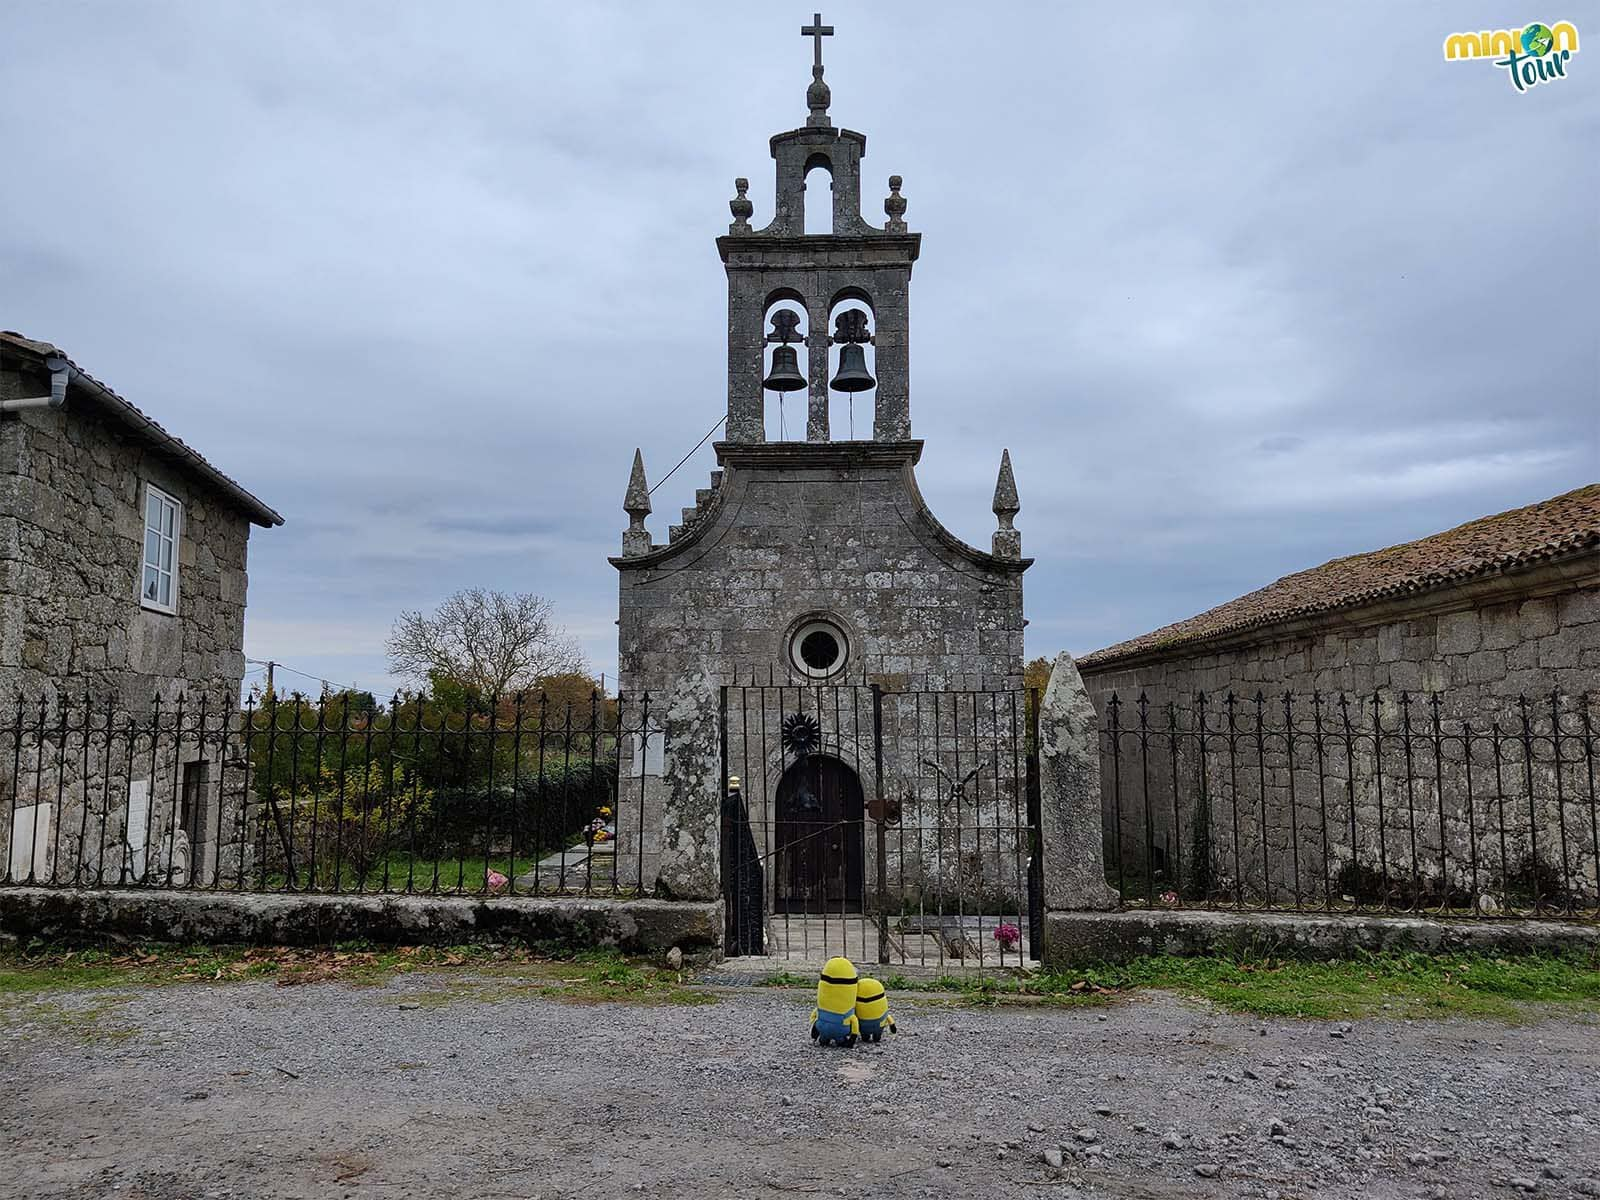 Hemos llegado a la Iglesia de Mosteiro